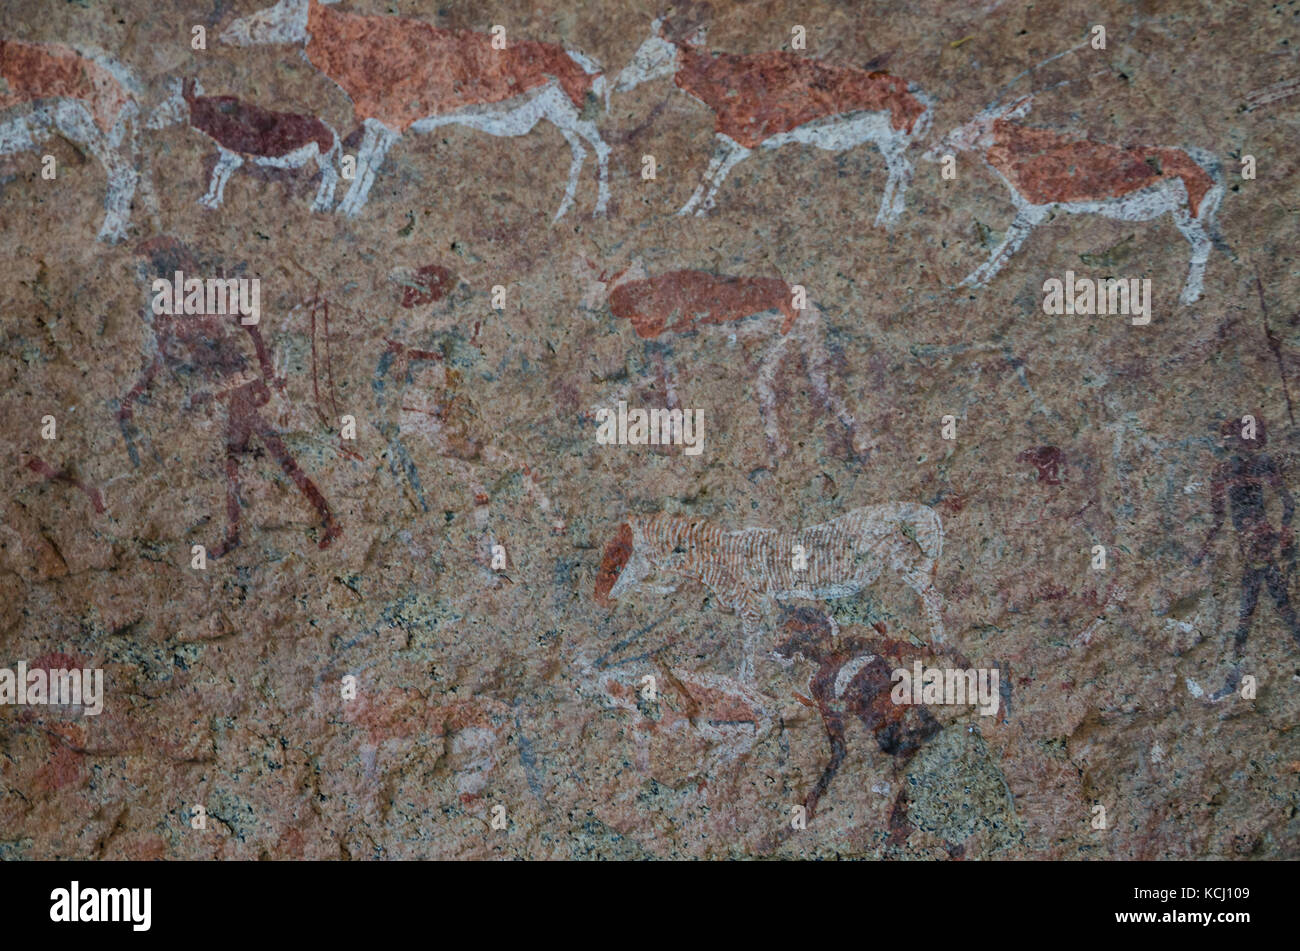 Detailled bushmen or San rock paintings at the White Lady panel, Brandberg, Damaraland, Namibia, Southern Africa - Stock Image